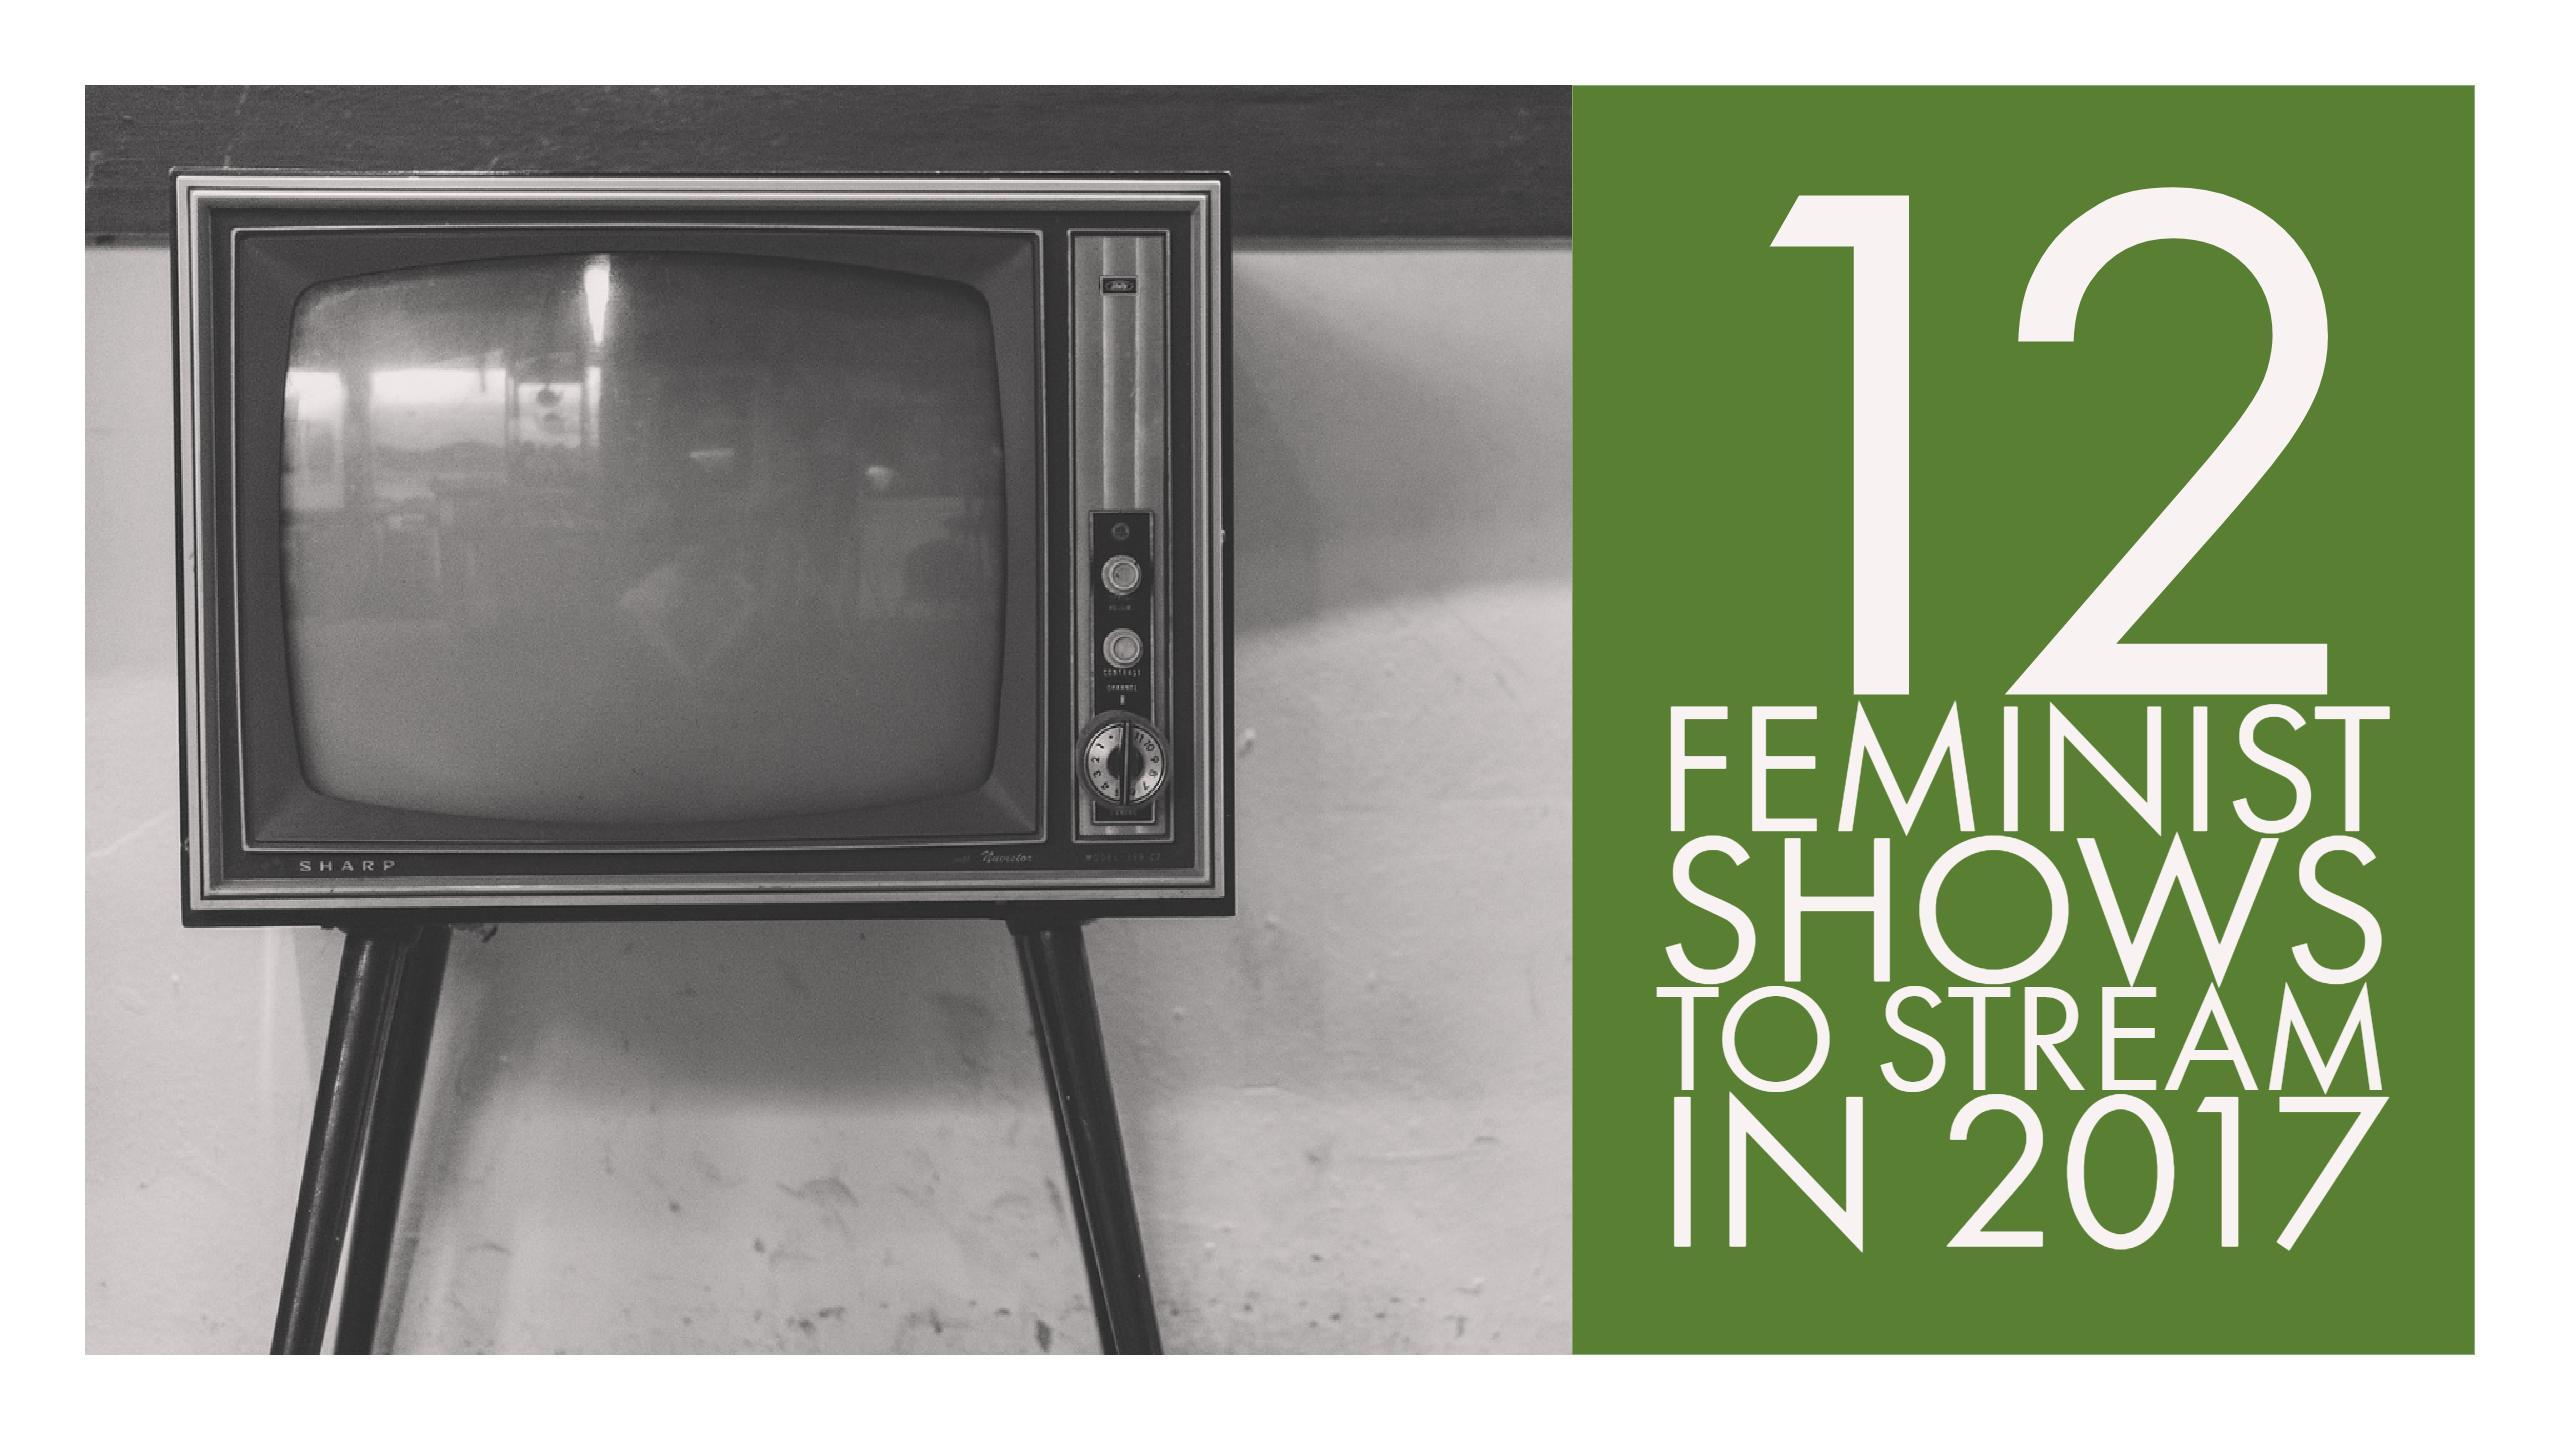 feminist shows